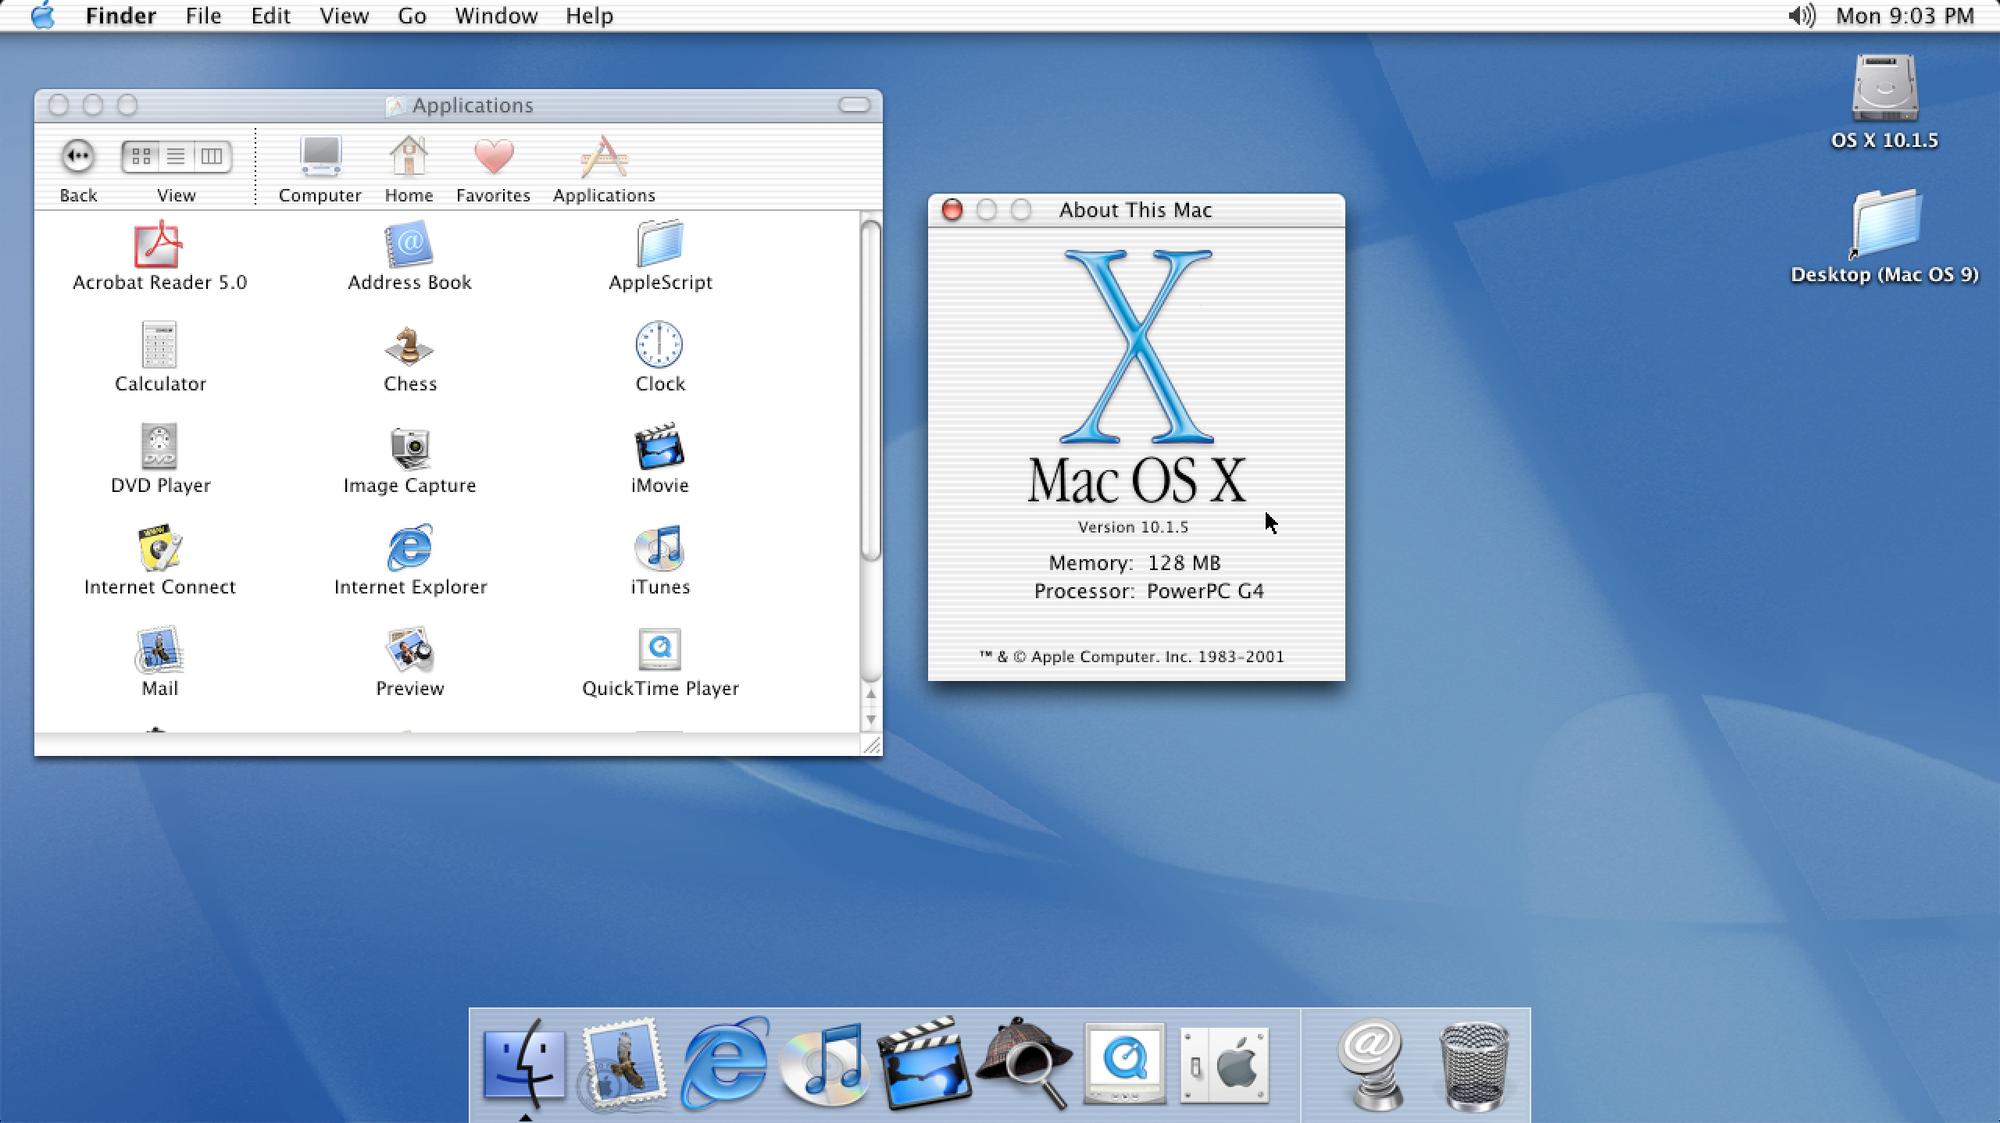 adobe reader for mac 10.11.1